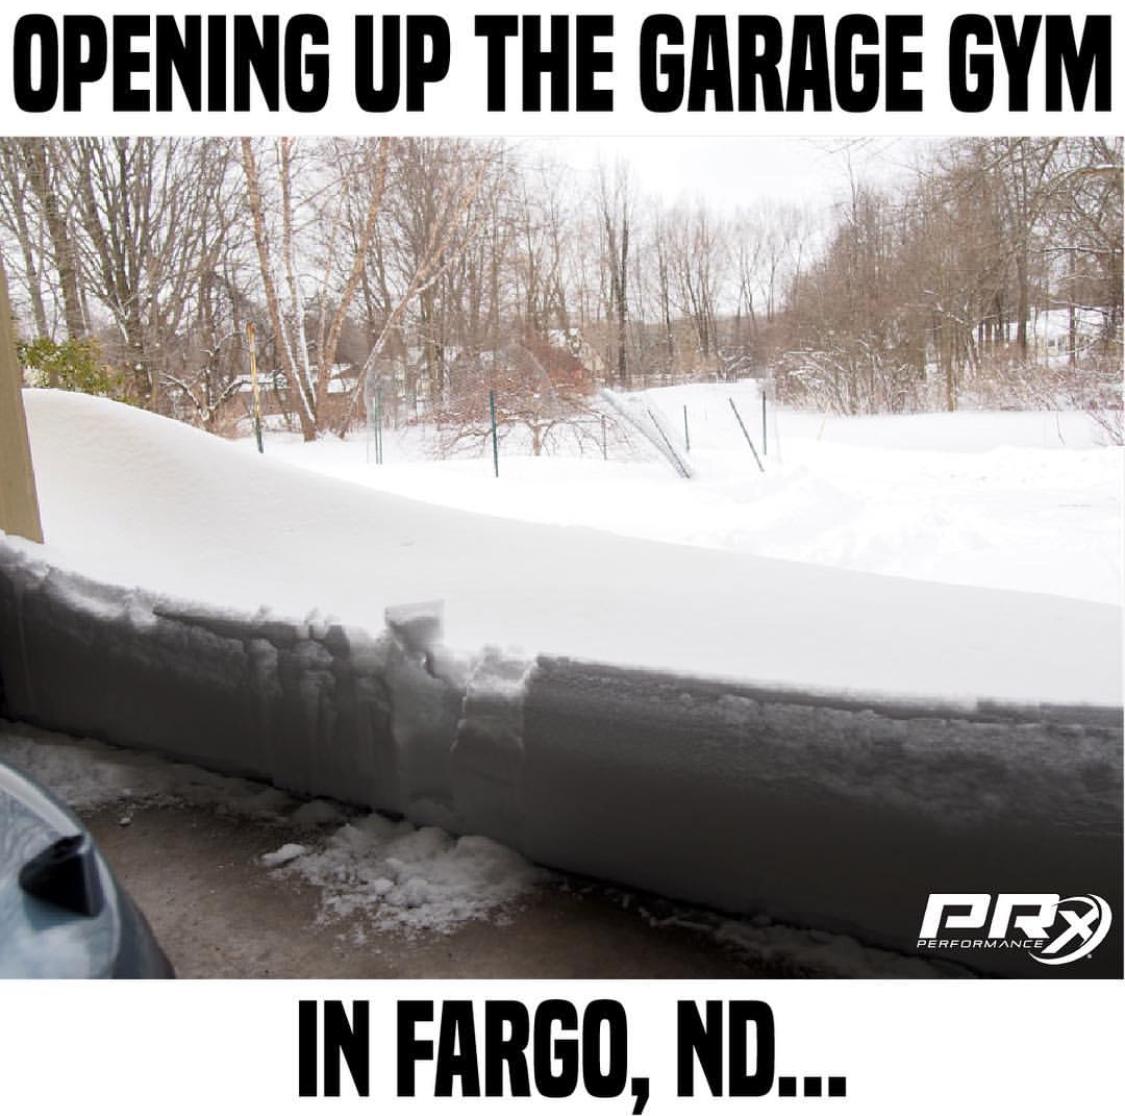 Start a garage gym they said it ll be fun they said gym humor